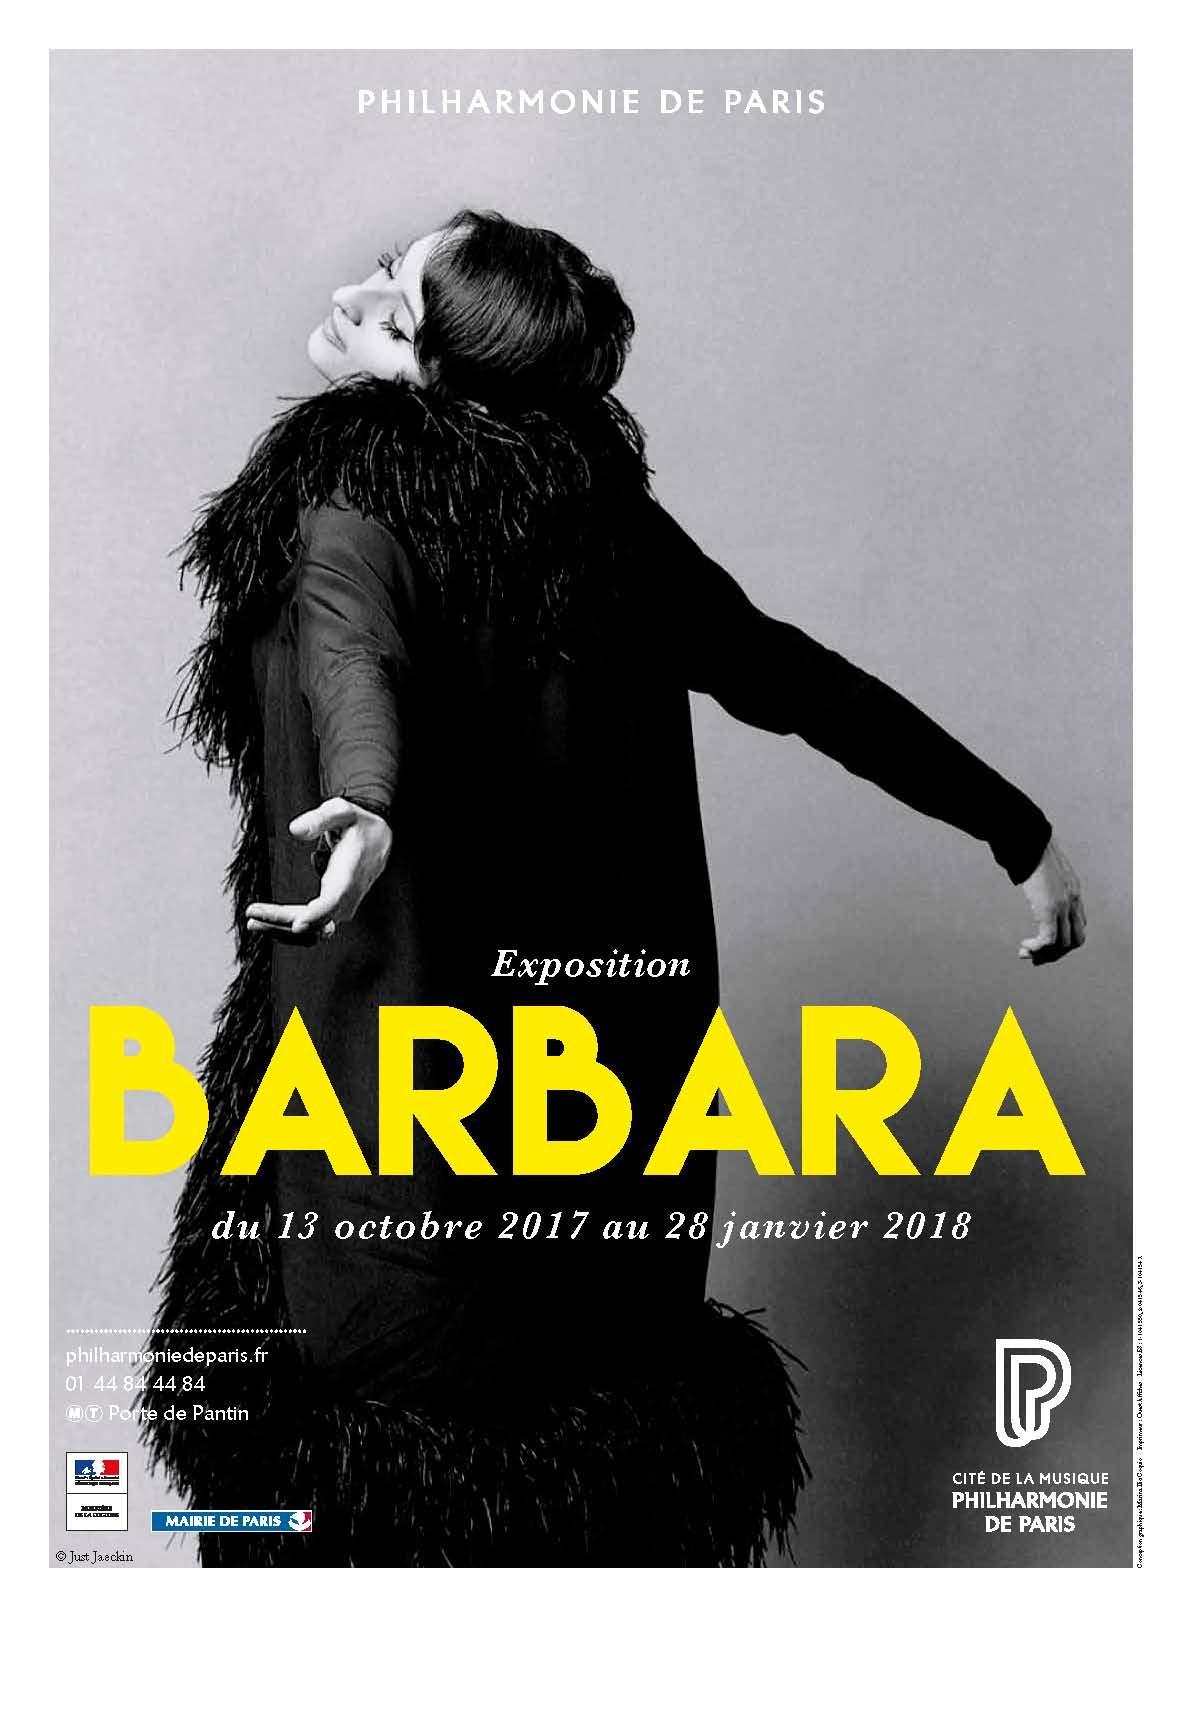 Barbara. Exposition du 13 octobre 2017 au 28 janvier 2018 |